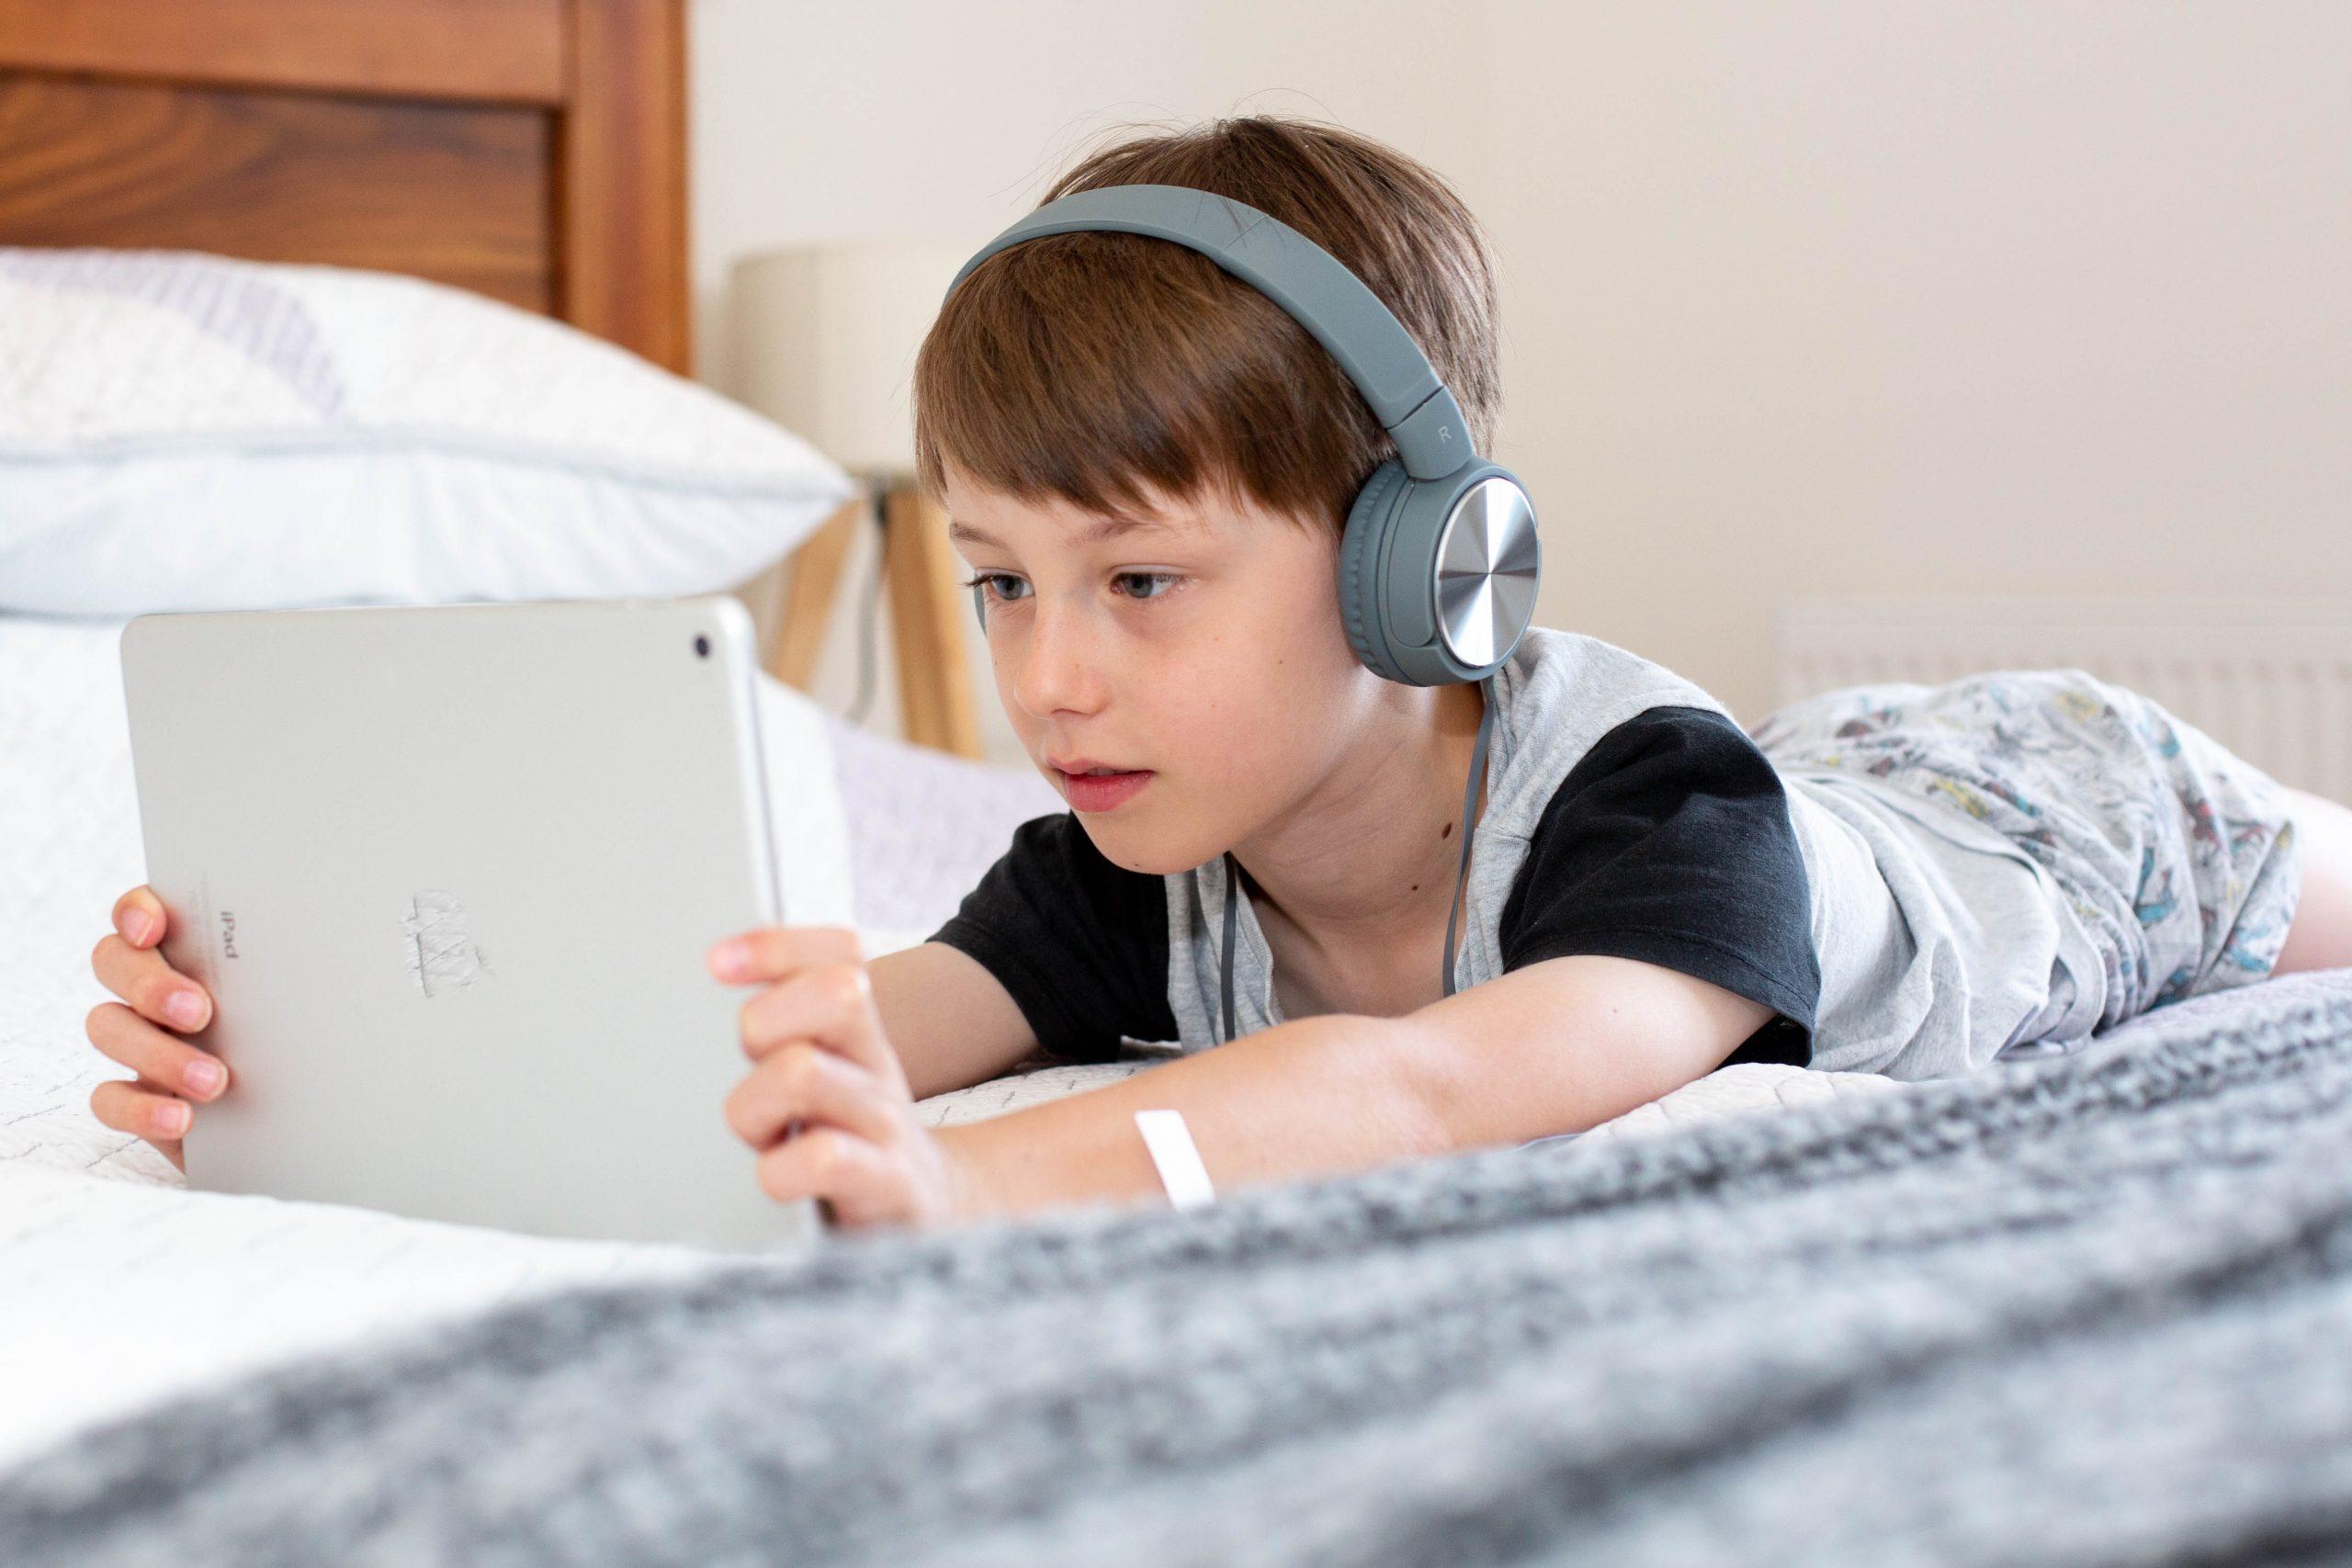 Menino deitado de barriga para baixo na cama segurando tablet e usando fone de ouvido